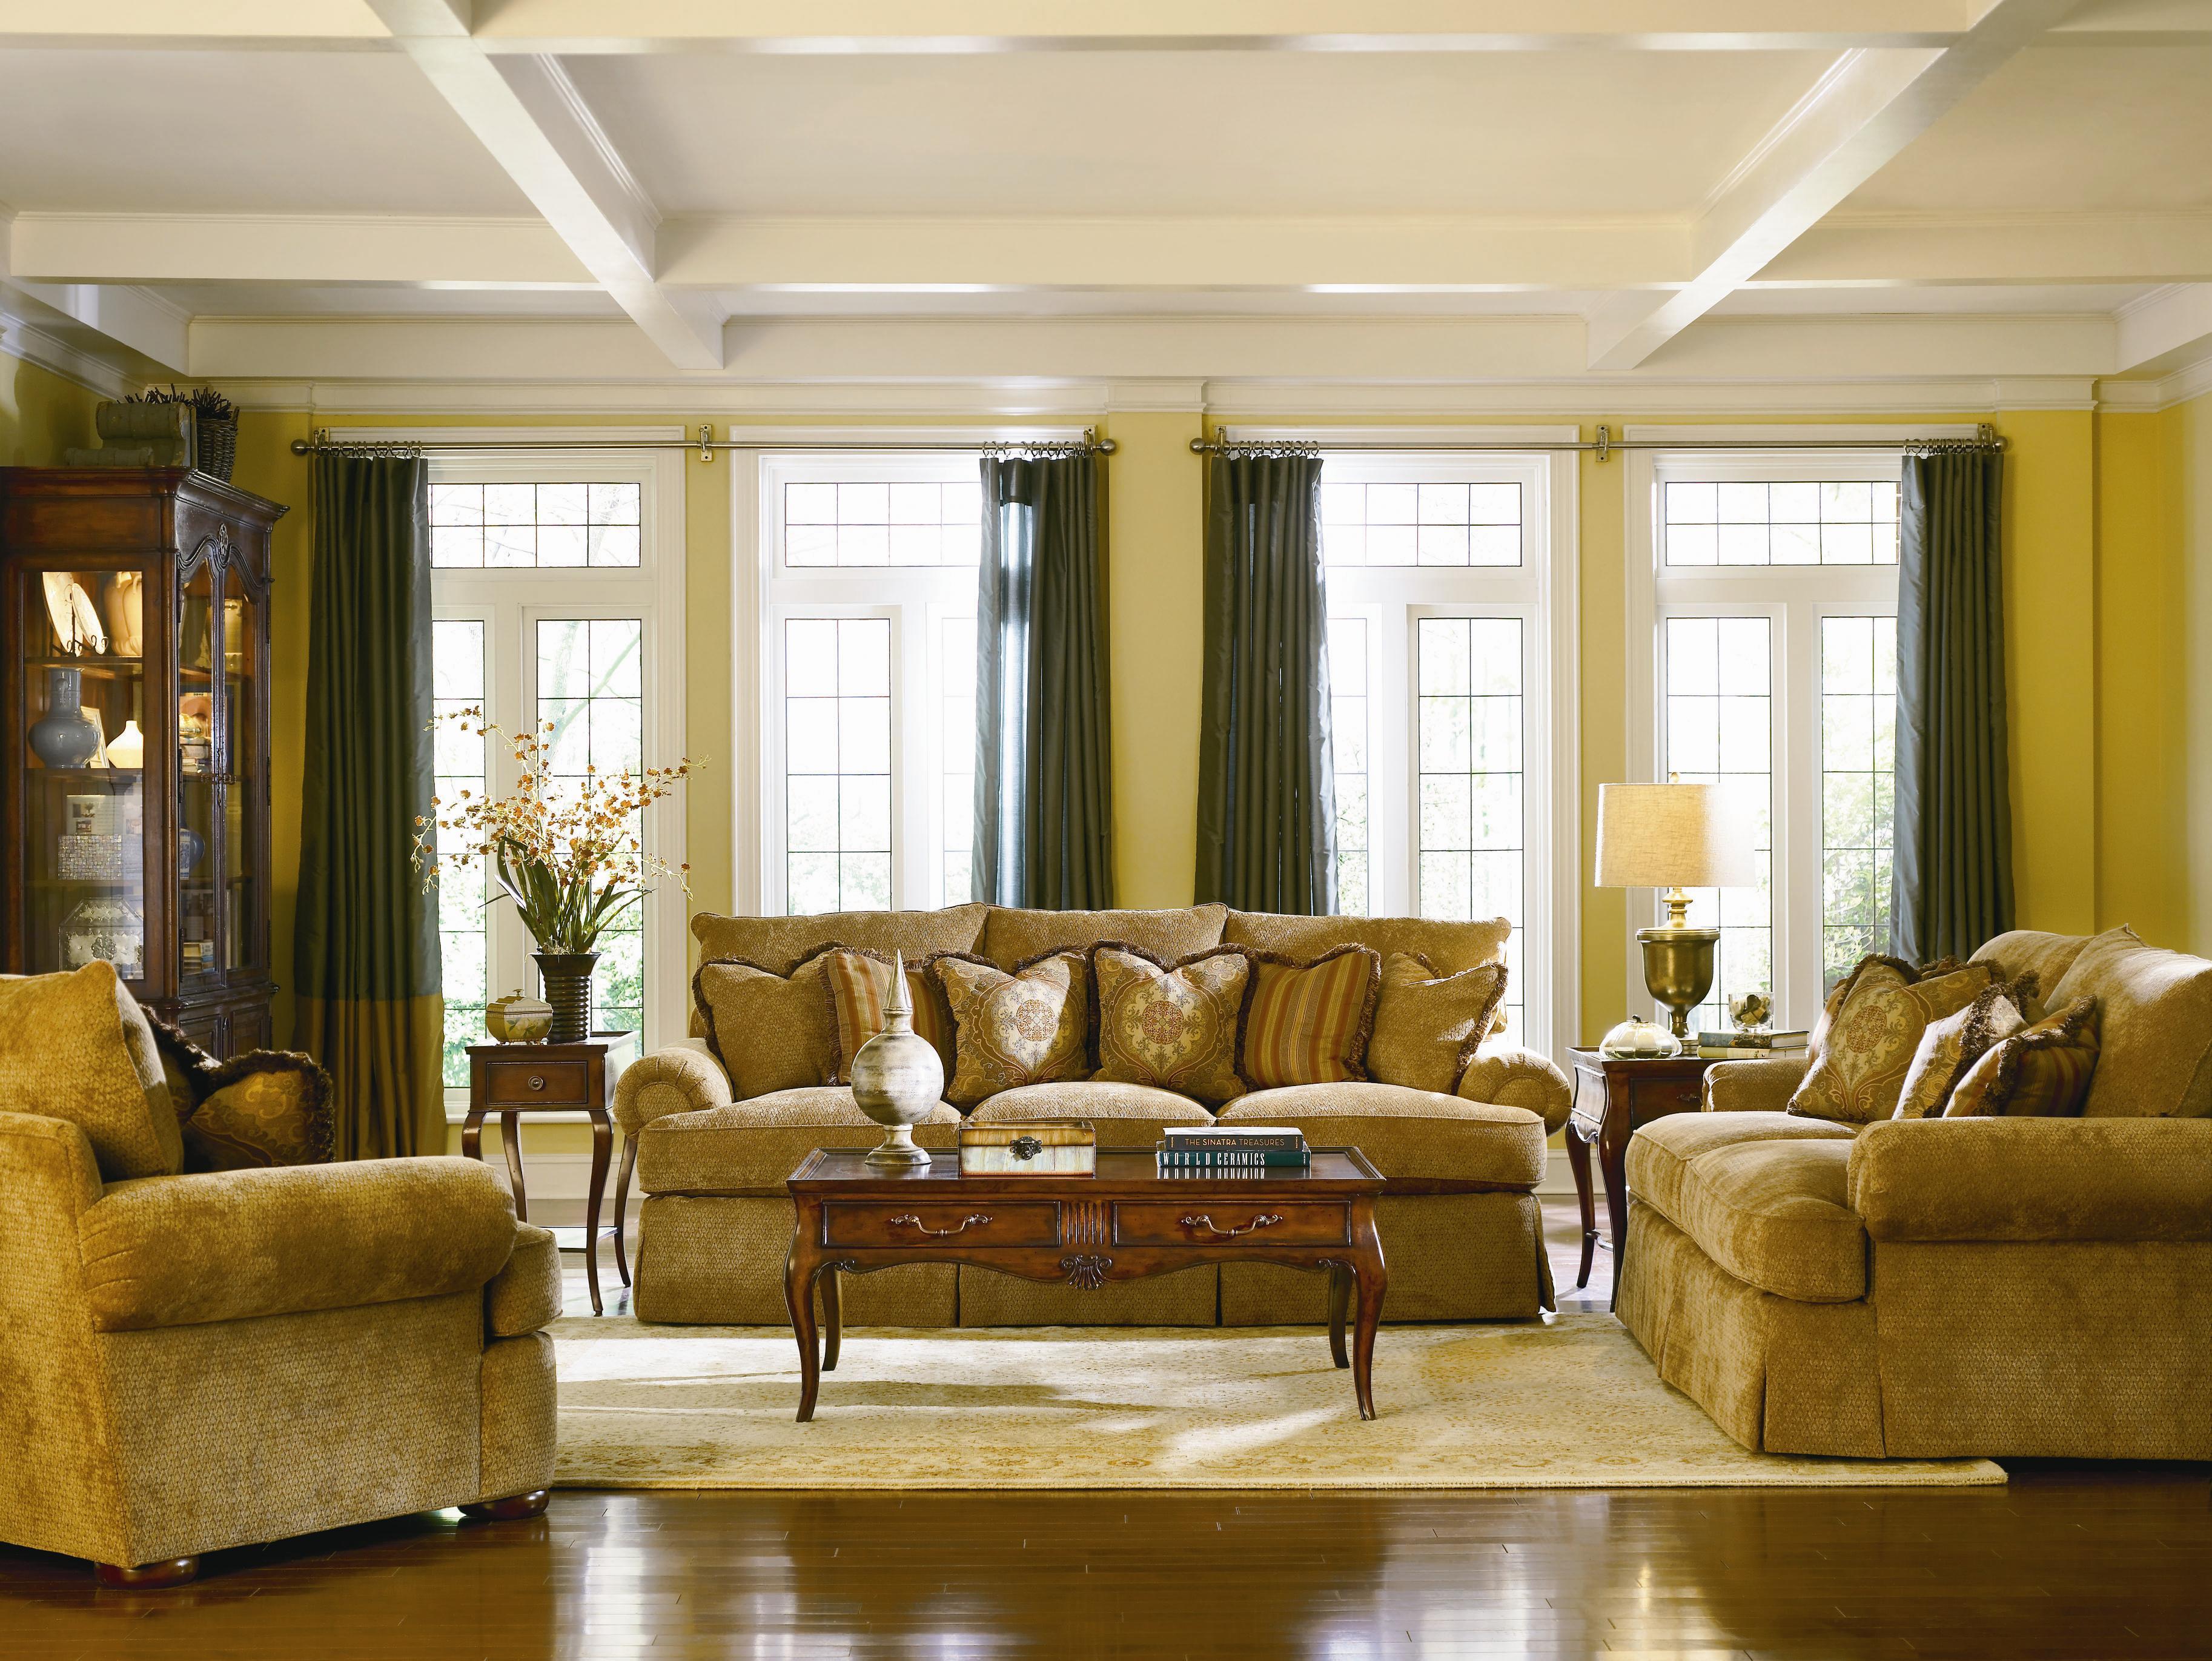 Thomasville Living Room Furniture Thomasvillear Special Values Dolce Vita Dolce Vita 2 Seat Sofa